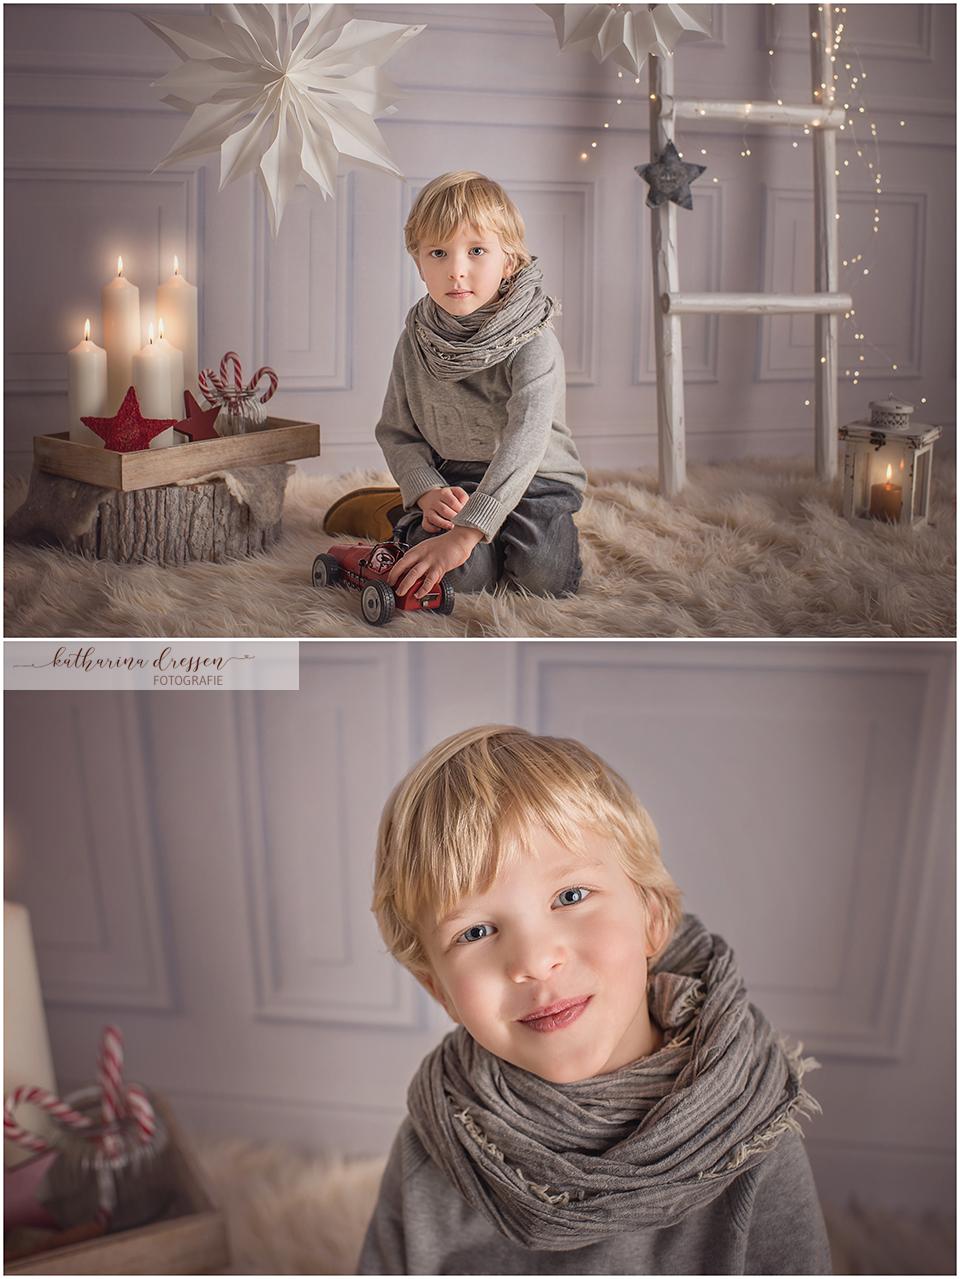 6_Kinderfotograf_Kinderfotoshooting_Familienbilder_Kinder-Fotoshooting_Fotograf_Duesseldorf_Fotoatelier_weihnachtsfotos_Xmas